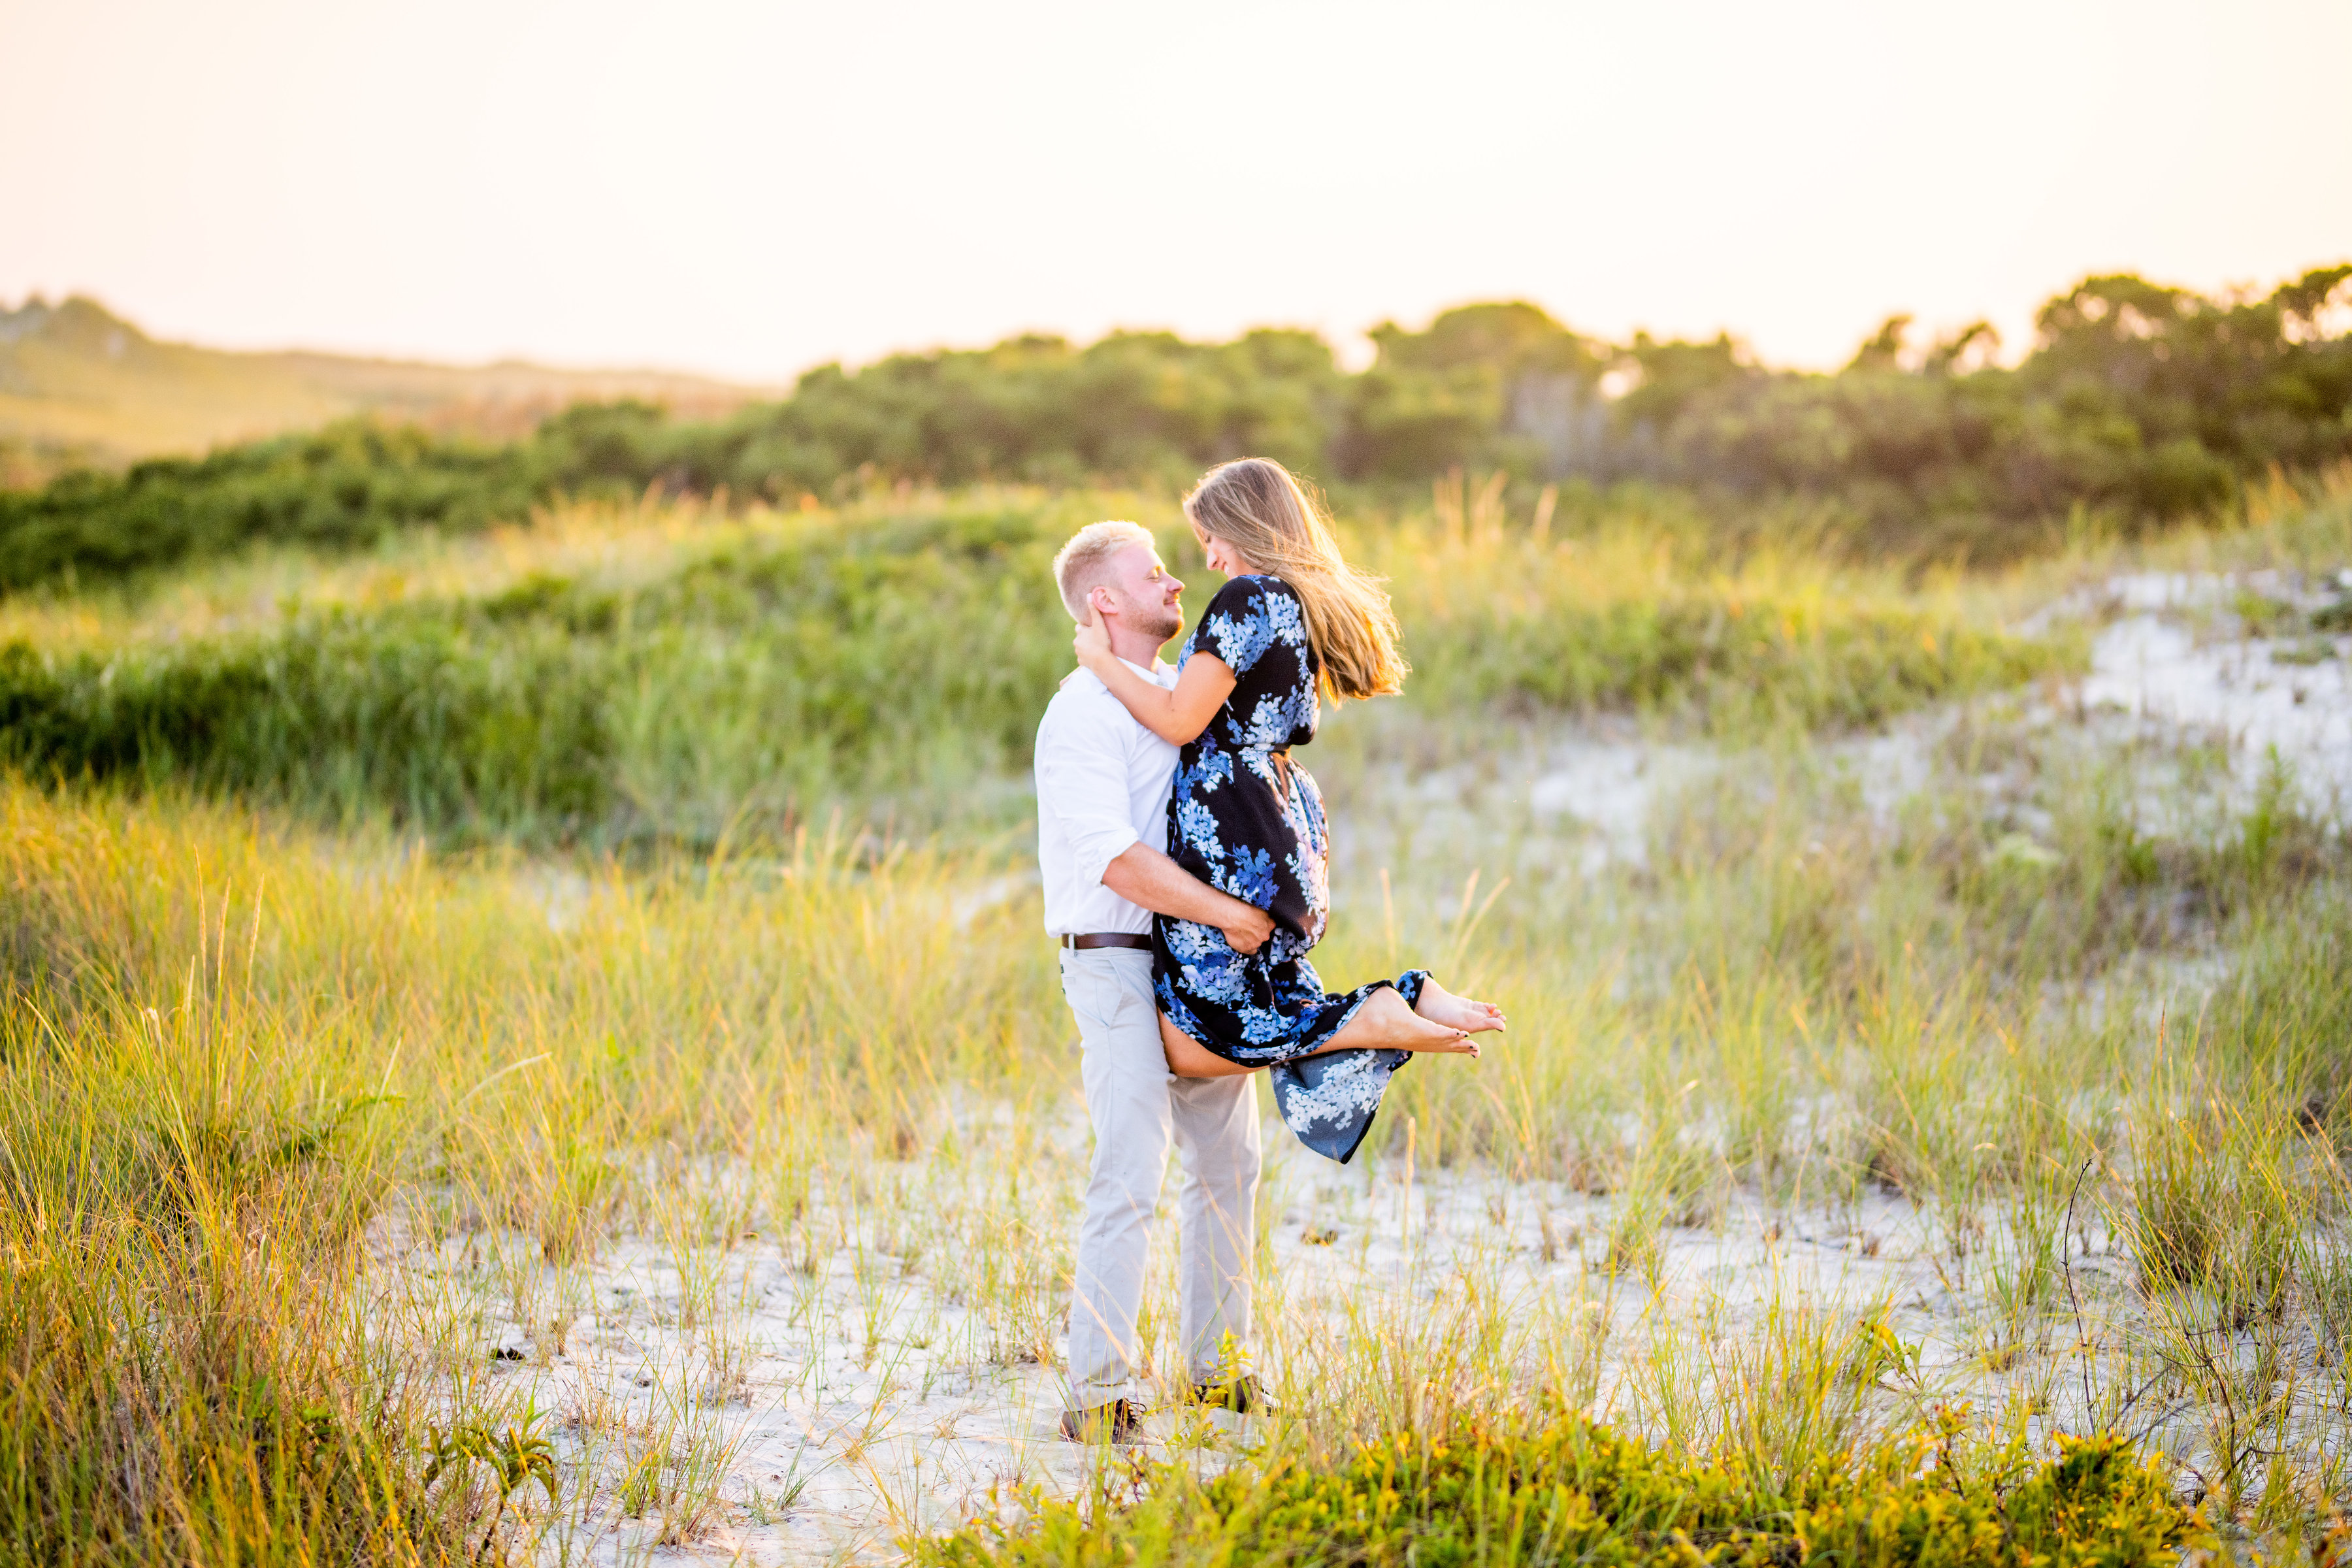 Dune Road Engagement Shoot | Westhampton Beach Engagement Shoot | Hamptons Wedding Photographer14